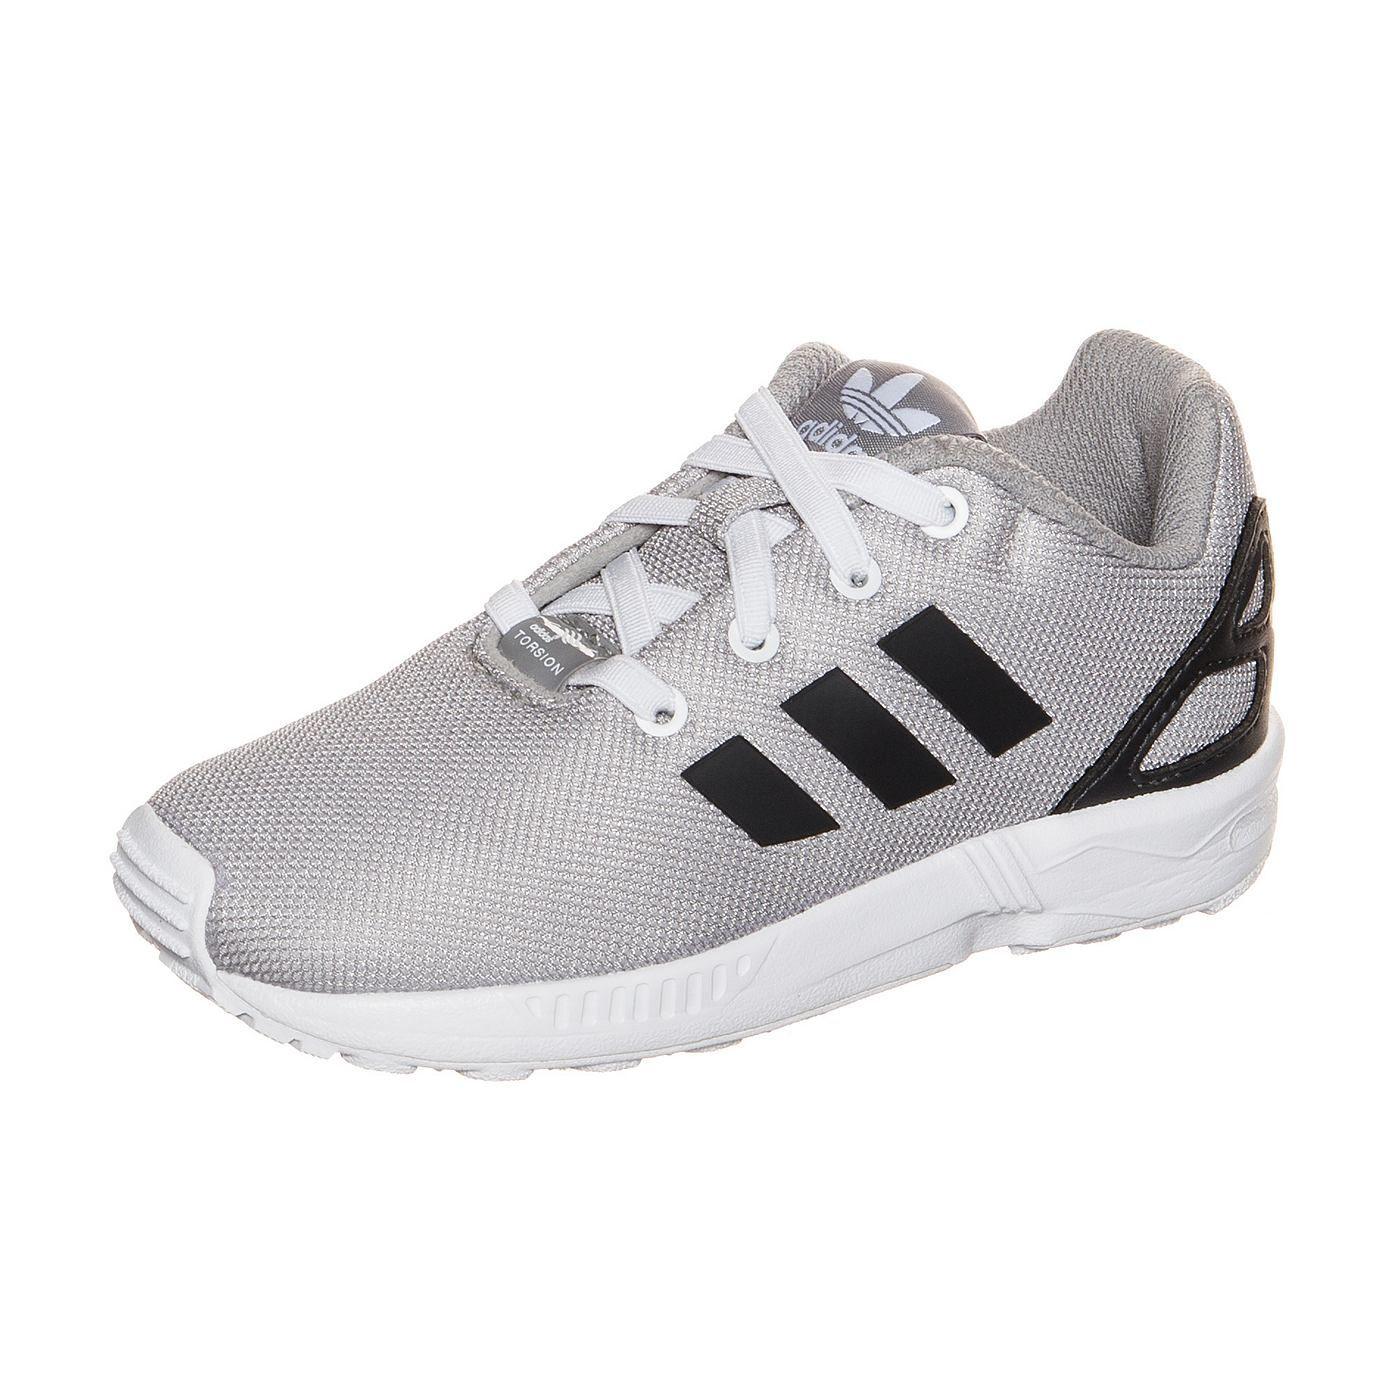 Adidas Zx Flux Grau Schwarz